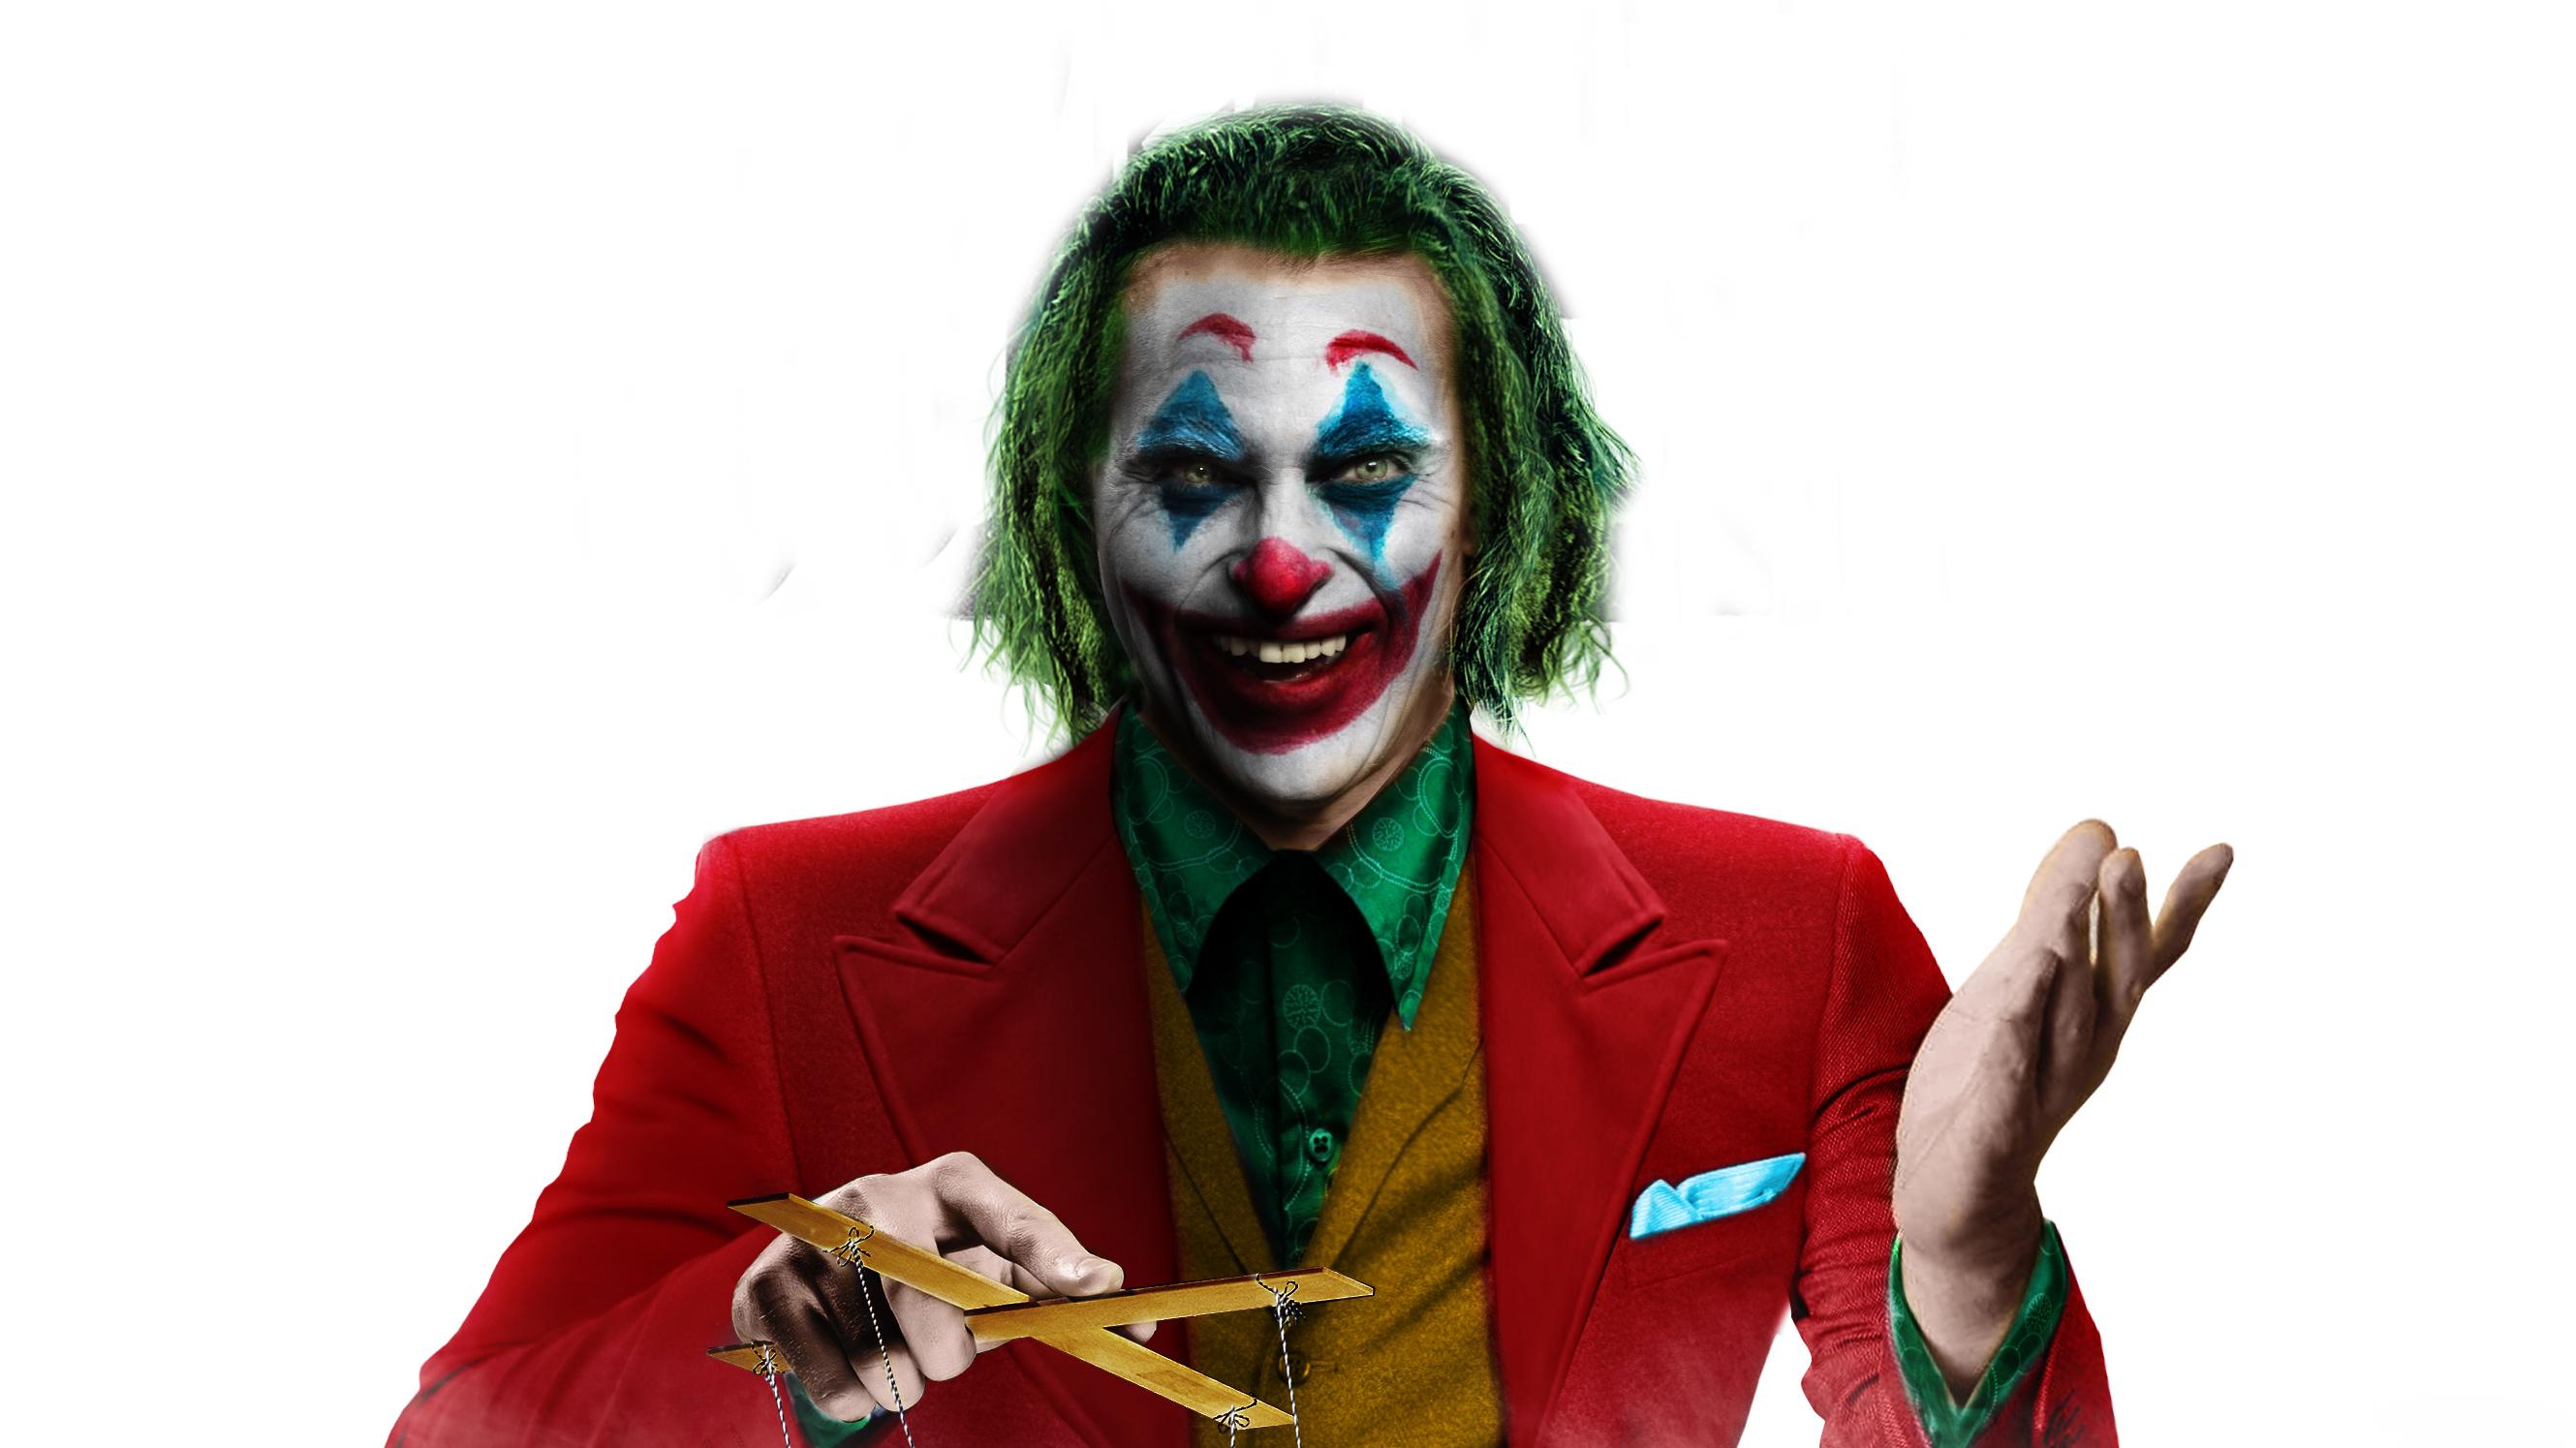 2019 Joker Art Hd Superheroes 4k Wallpapers Images